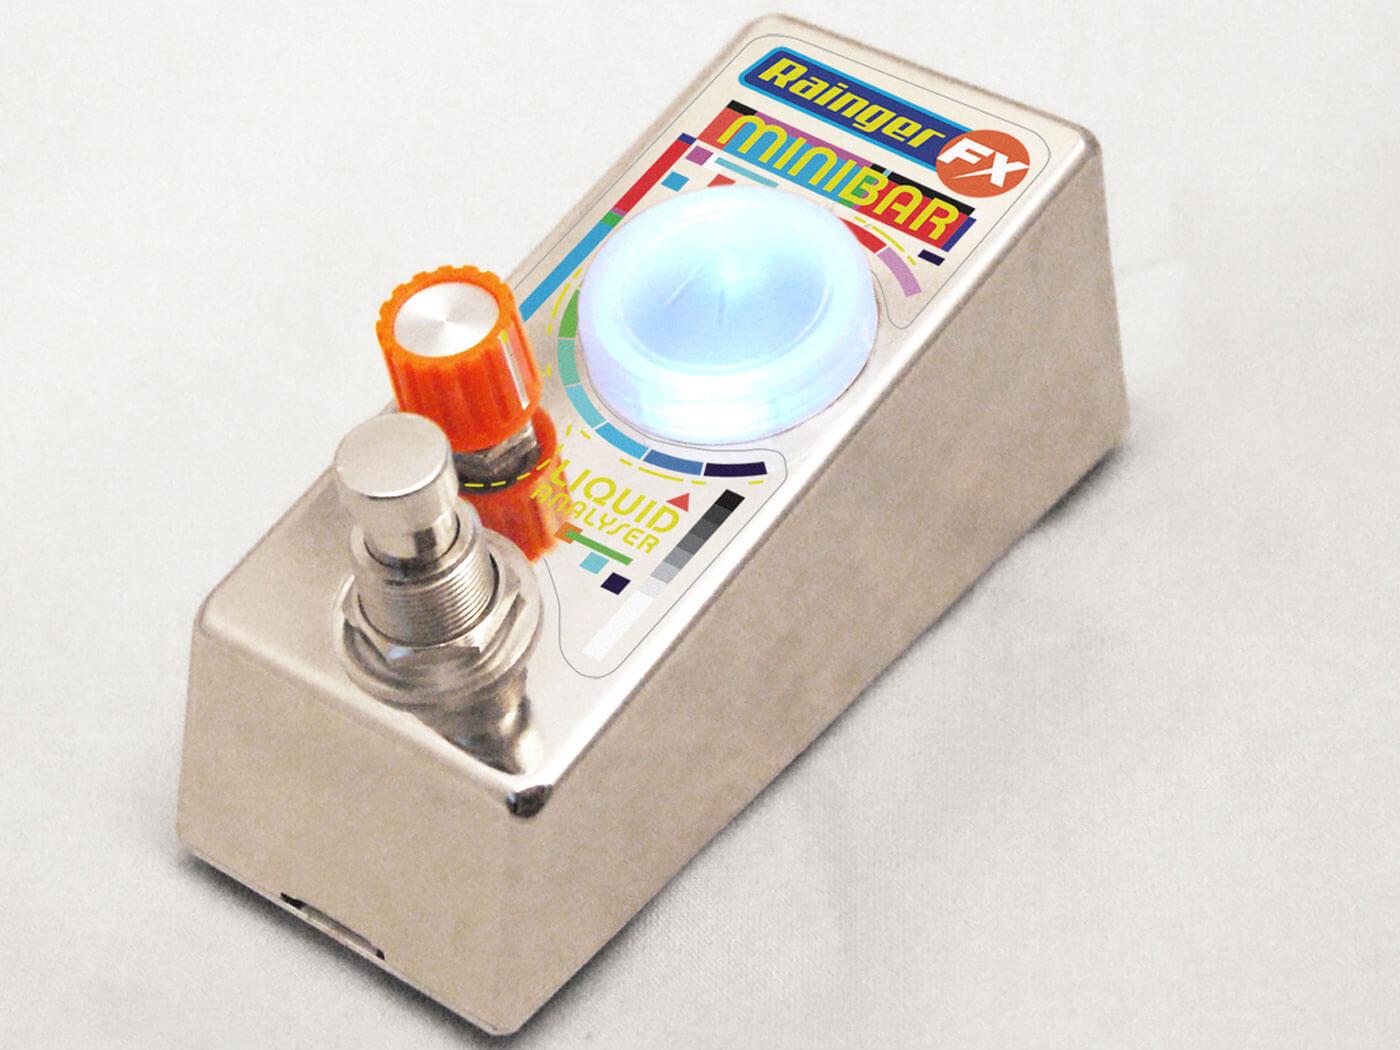 Rainger FX launches the Minibar – a pedal you pour liquid into